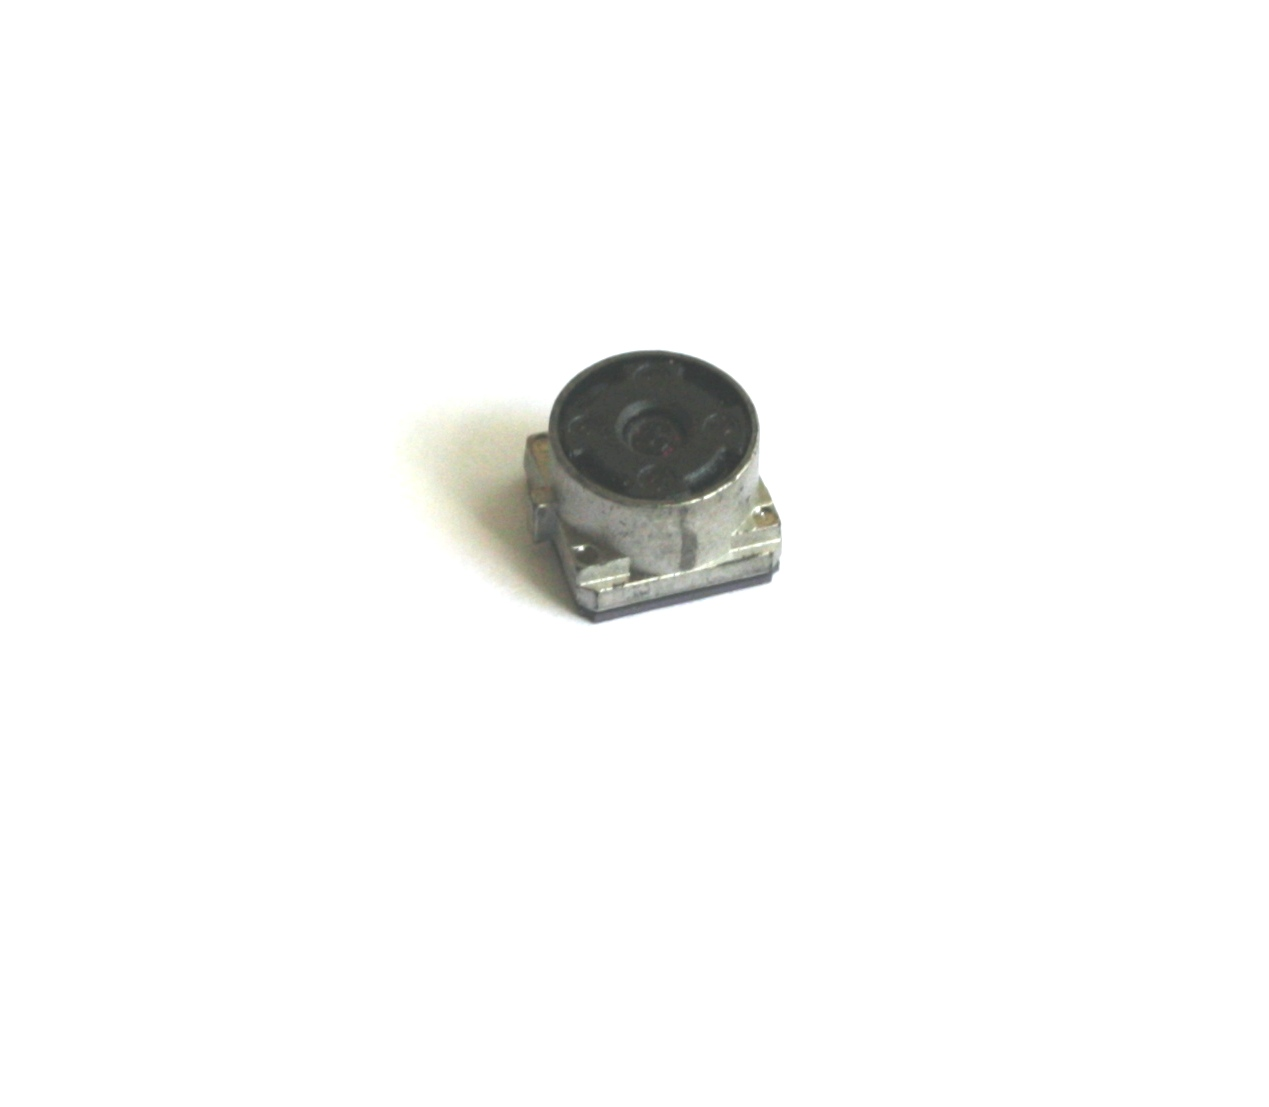 Camera Nokia 3710f,5330,5630,6303i,6730c,6760s,7230,C5-00,E52,E55,X3-00